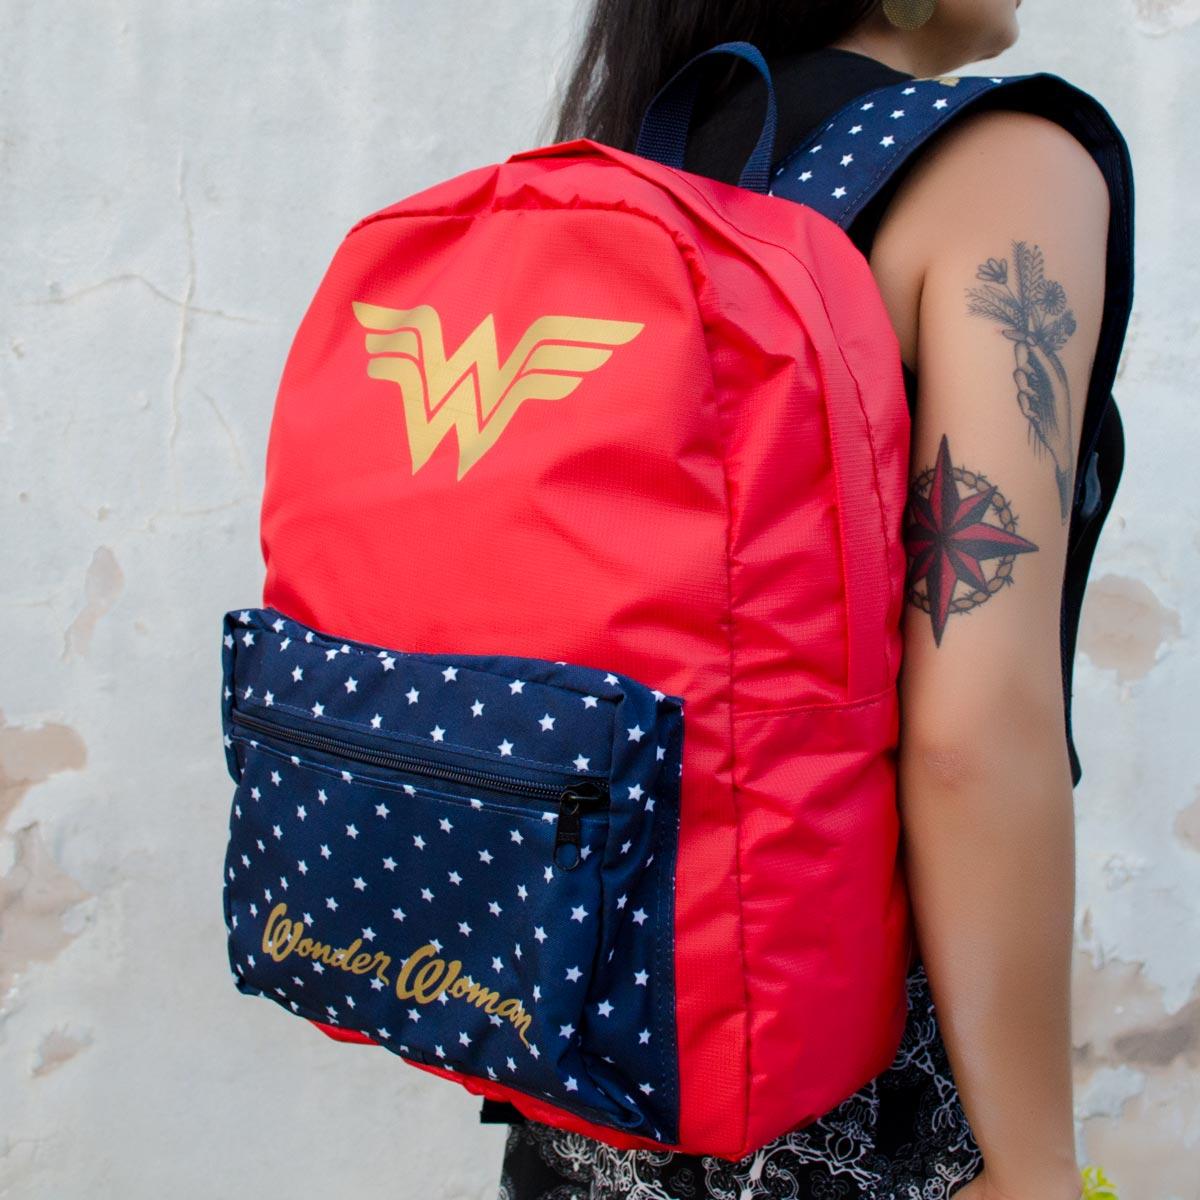 2º Lote Mochila Wonder Woman Clássica